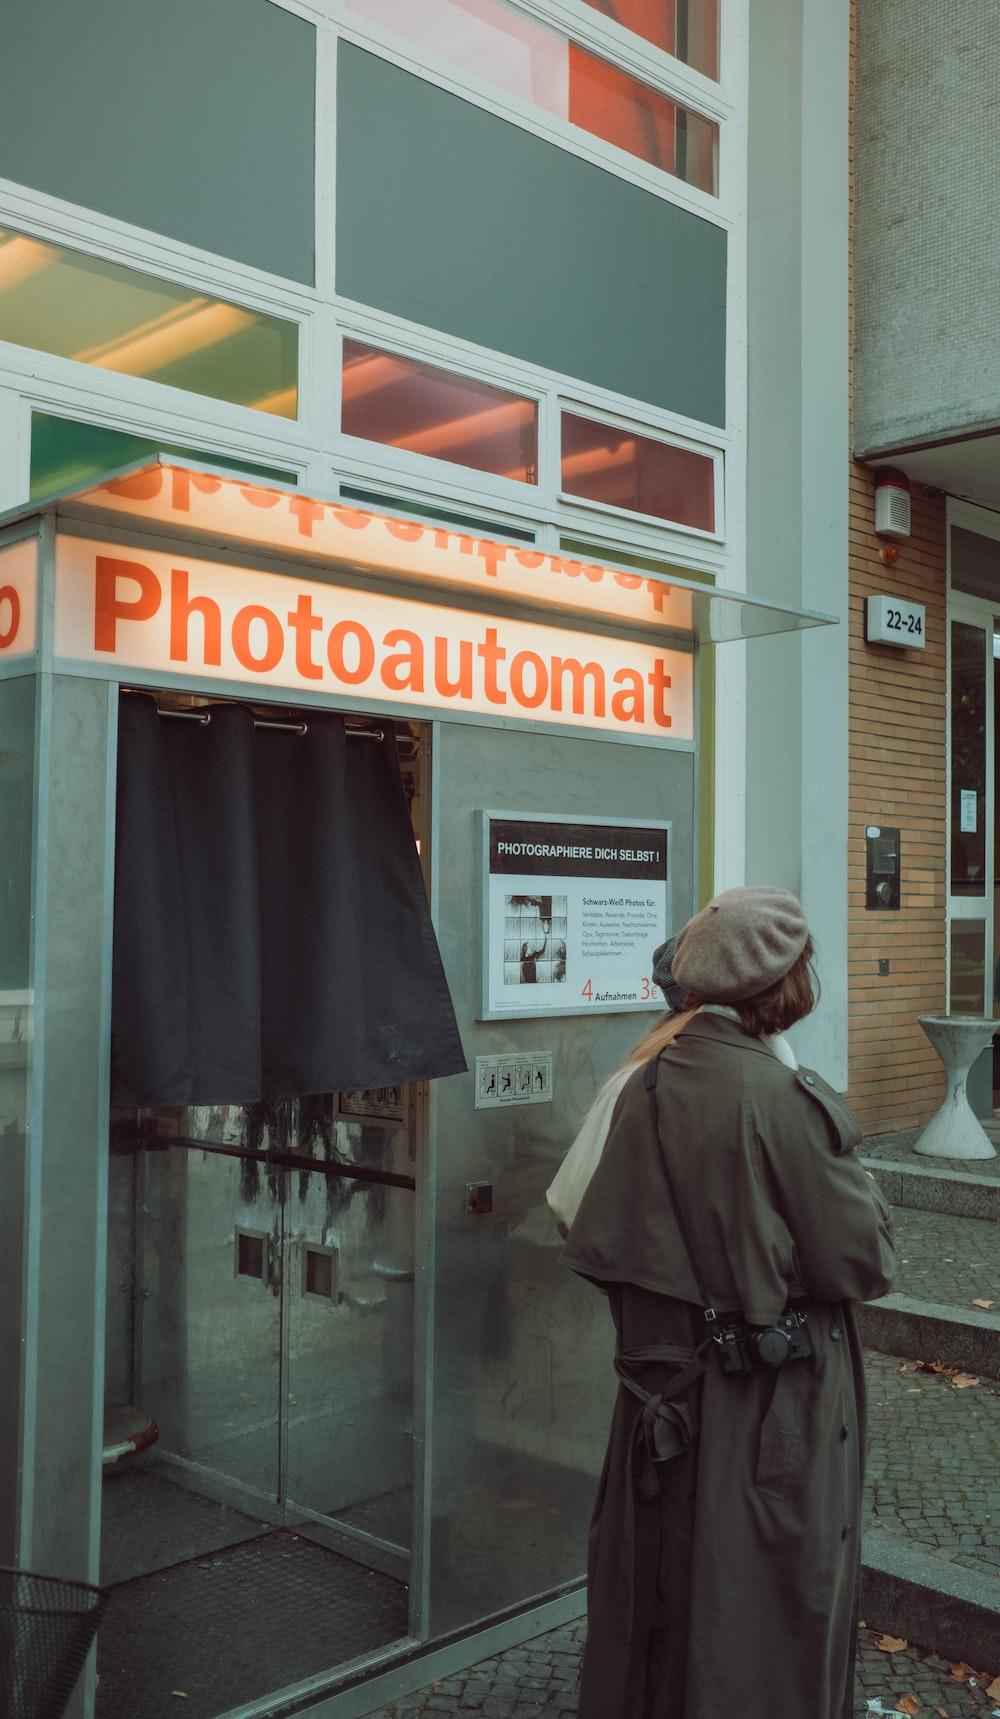 person in gray coat standing near glass window